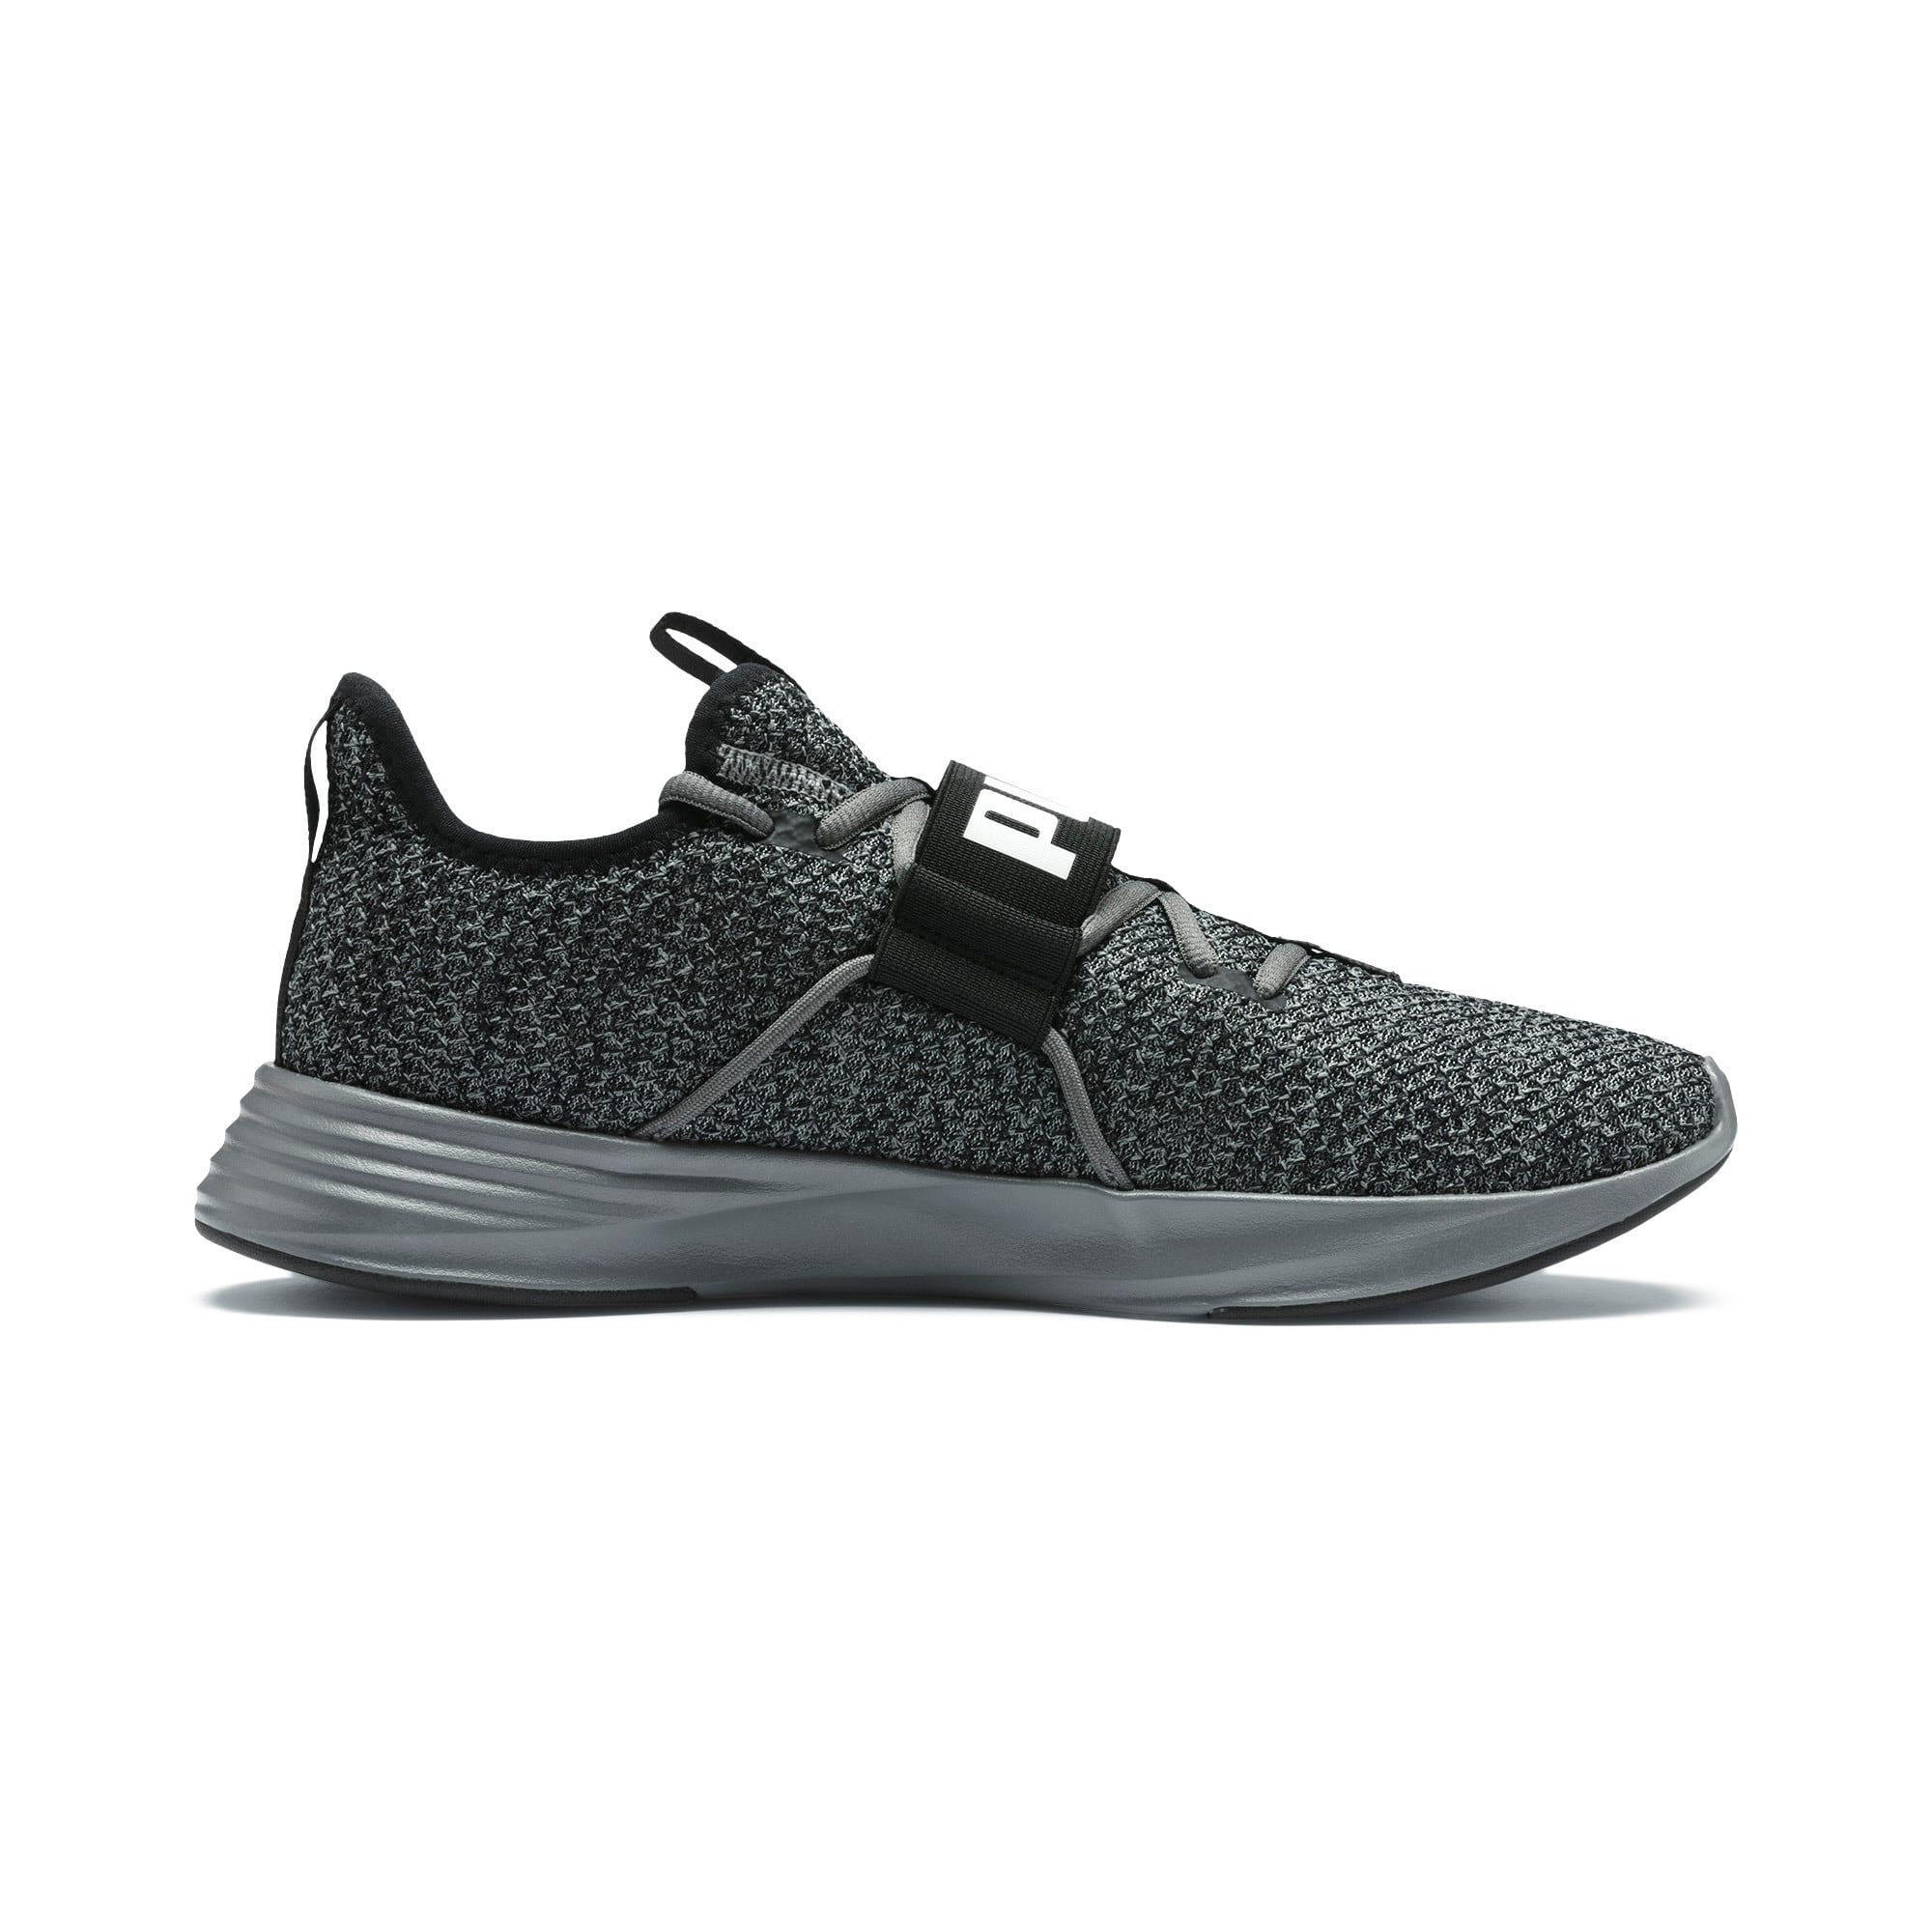 Thumbnail 6 of Persist XT Knit Men's Training Shoes, CASTLEROCK-Puma White, medium